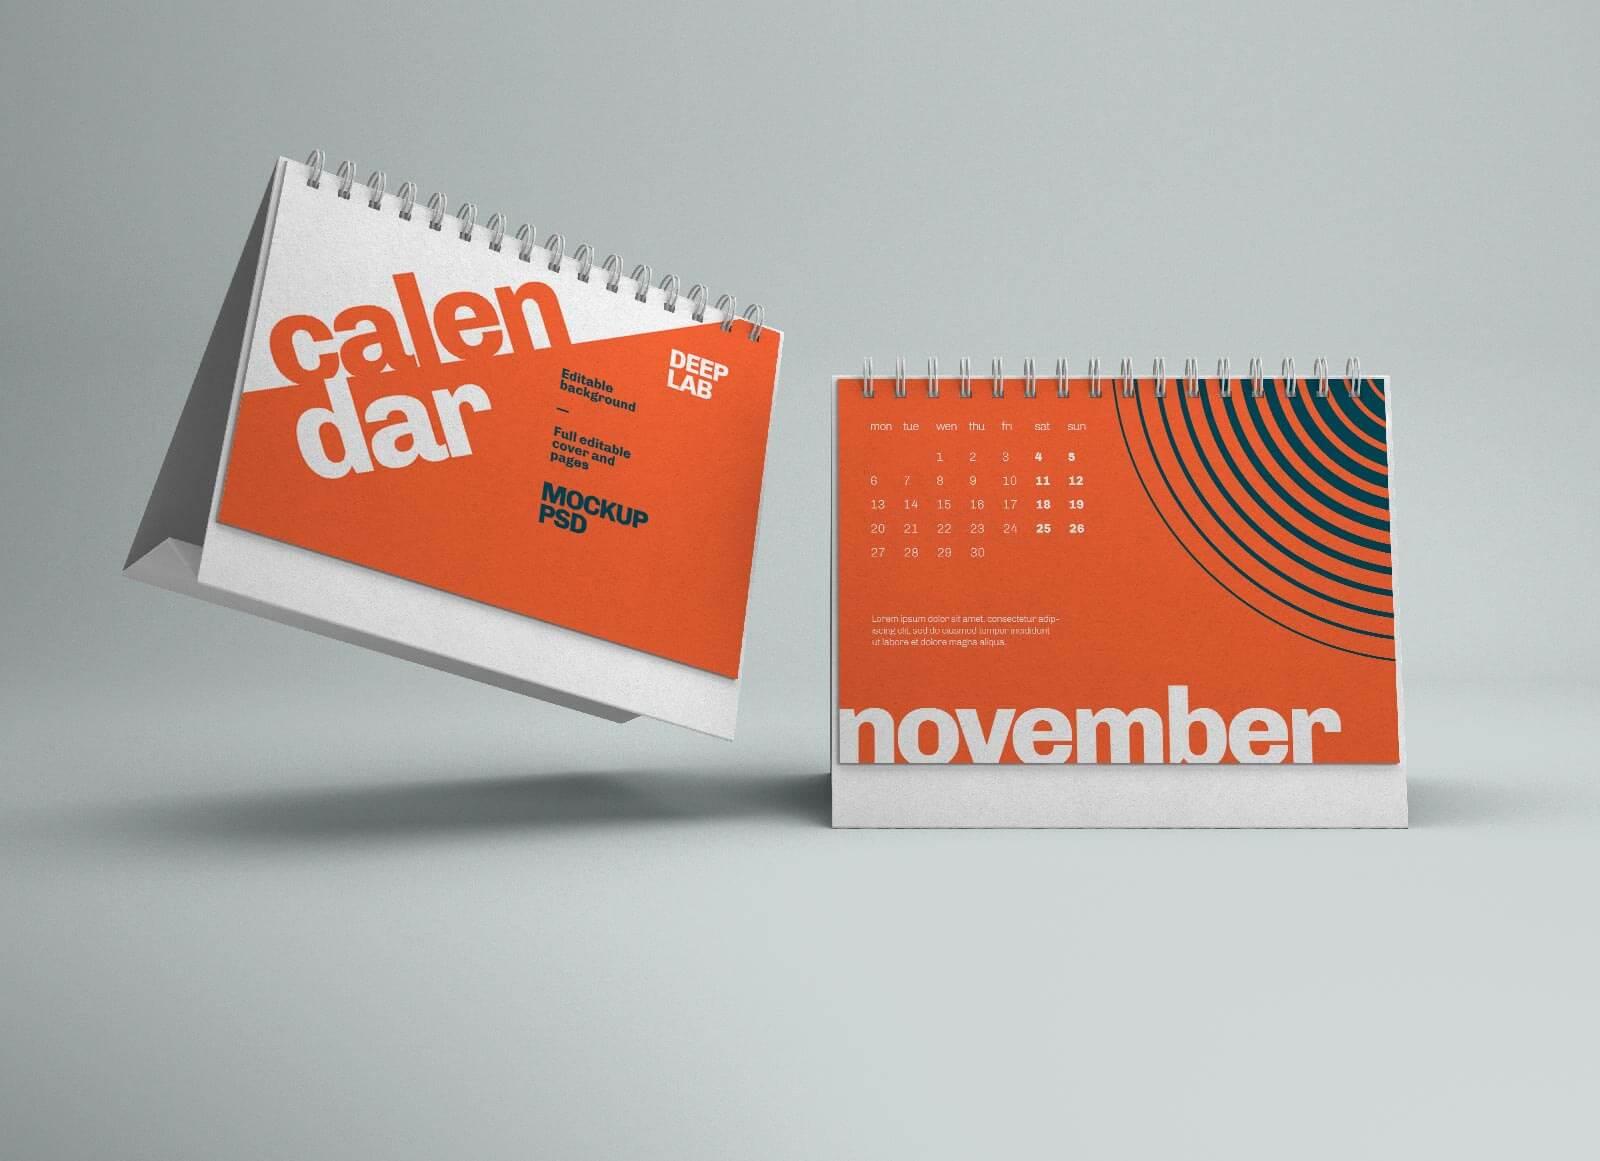 Free Horizontal Desk Calendar 2022 Mockup PSD (2)